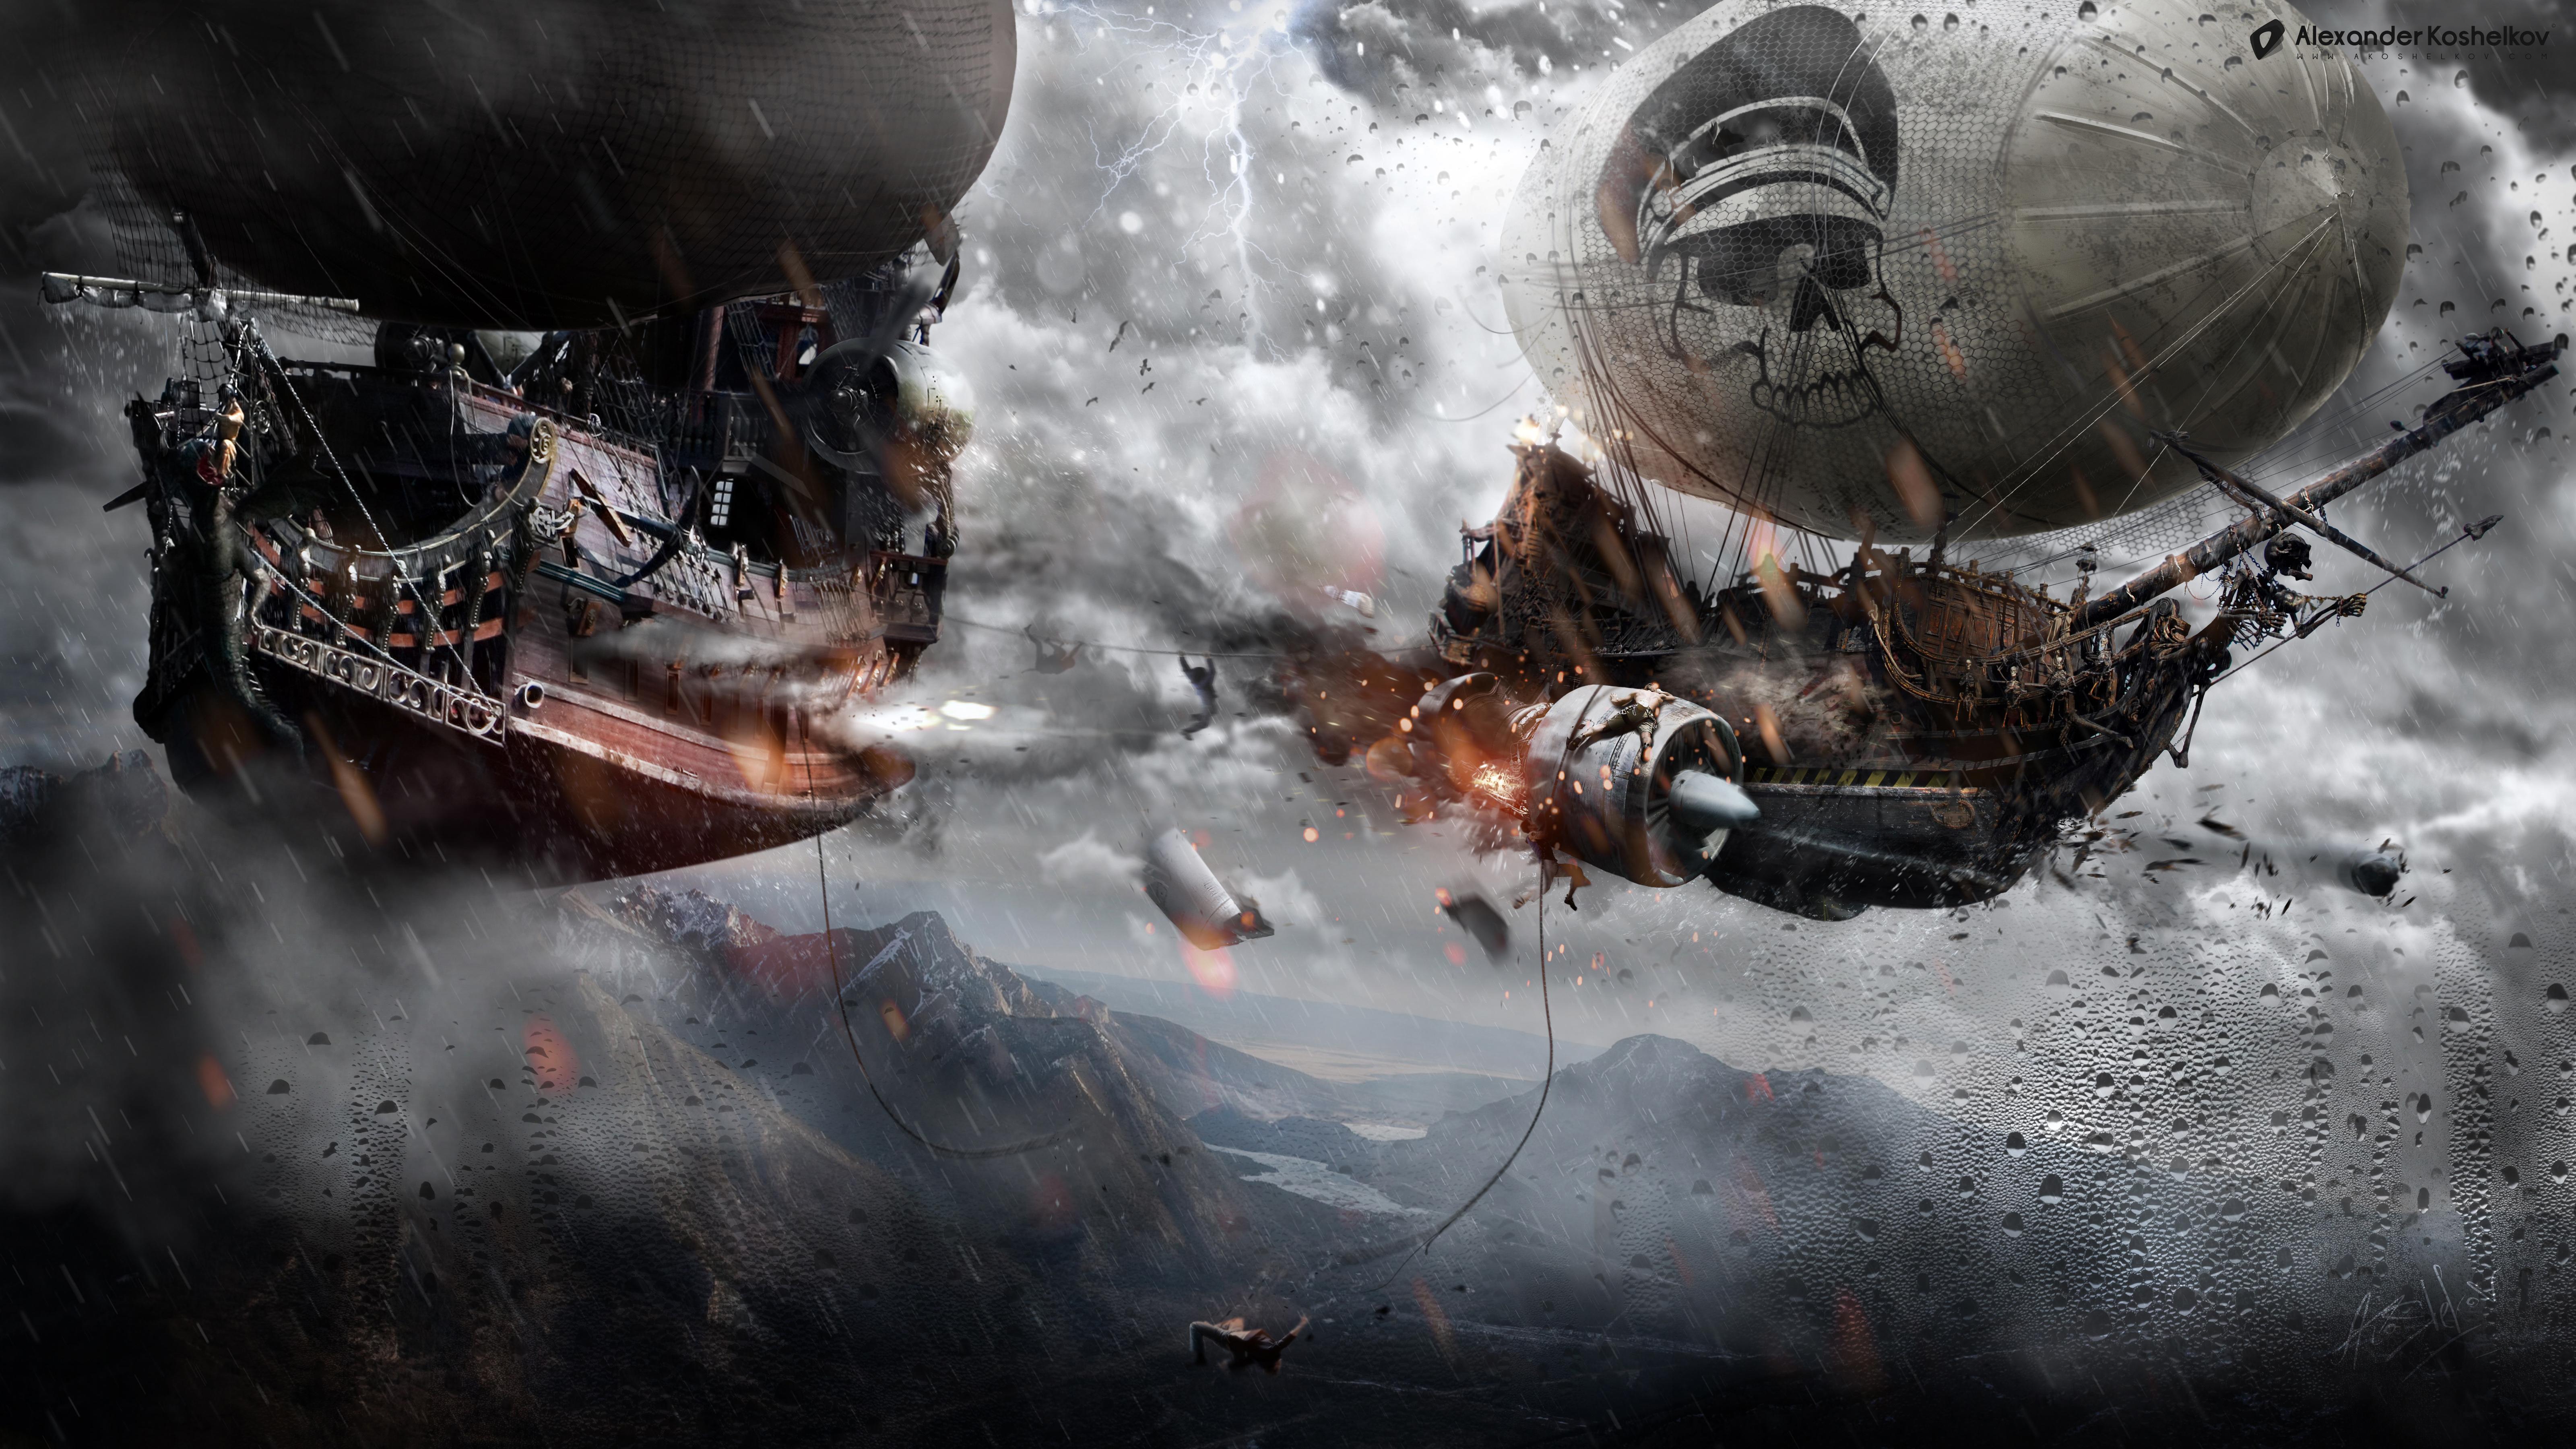 Airship Of Doom